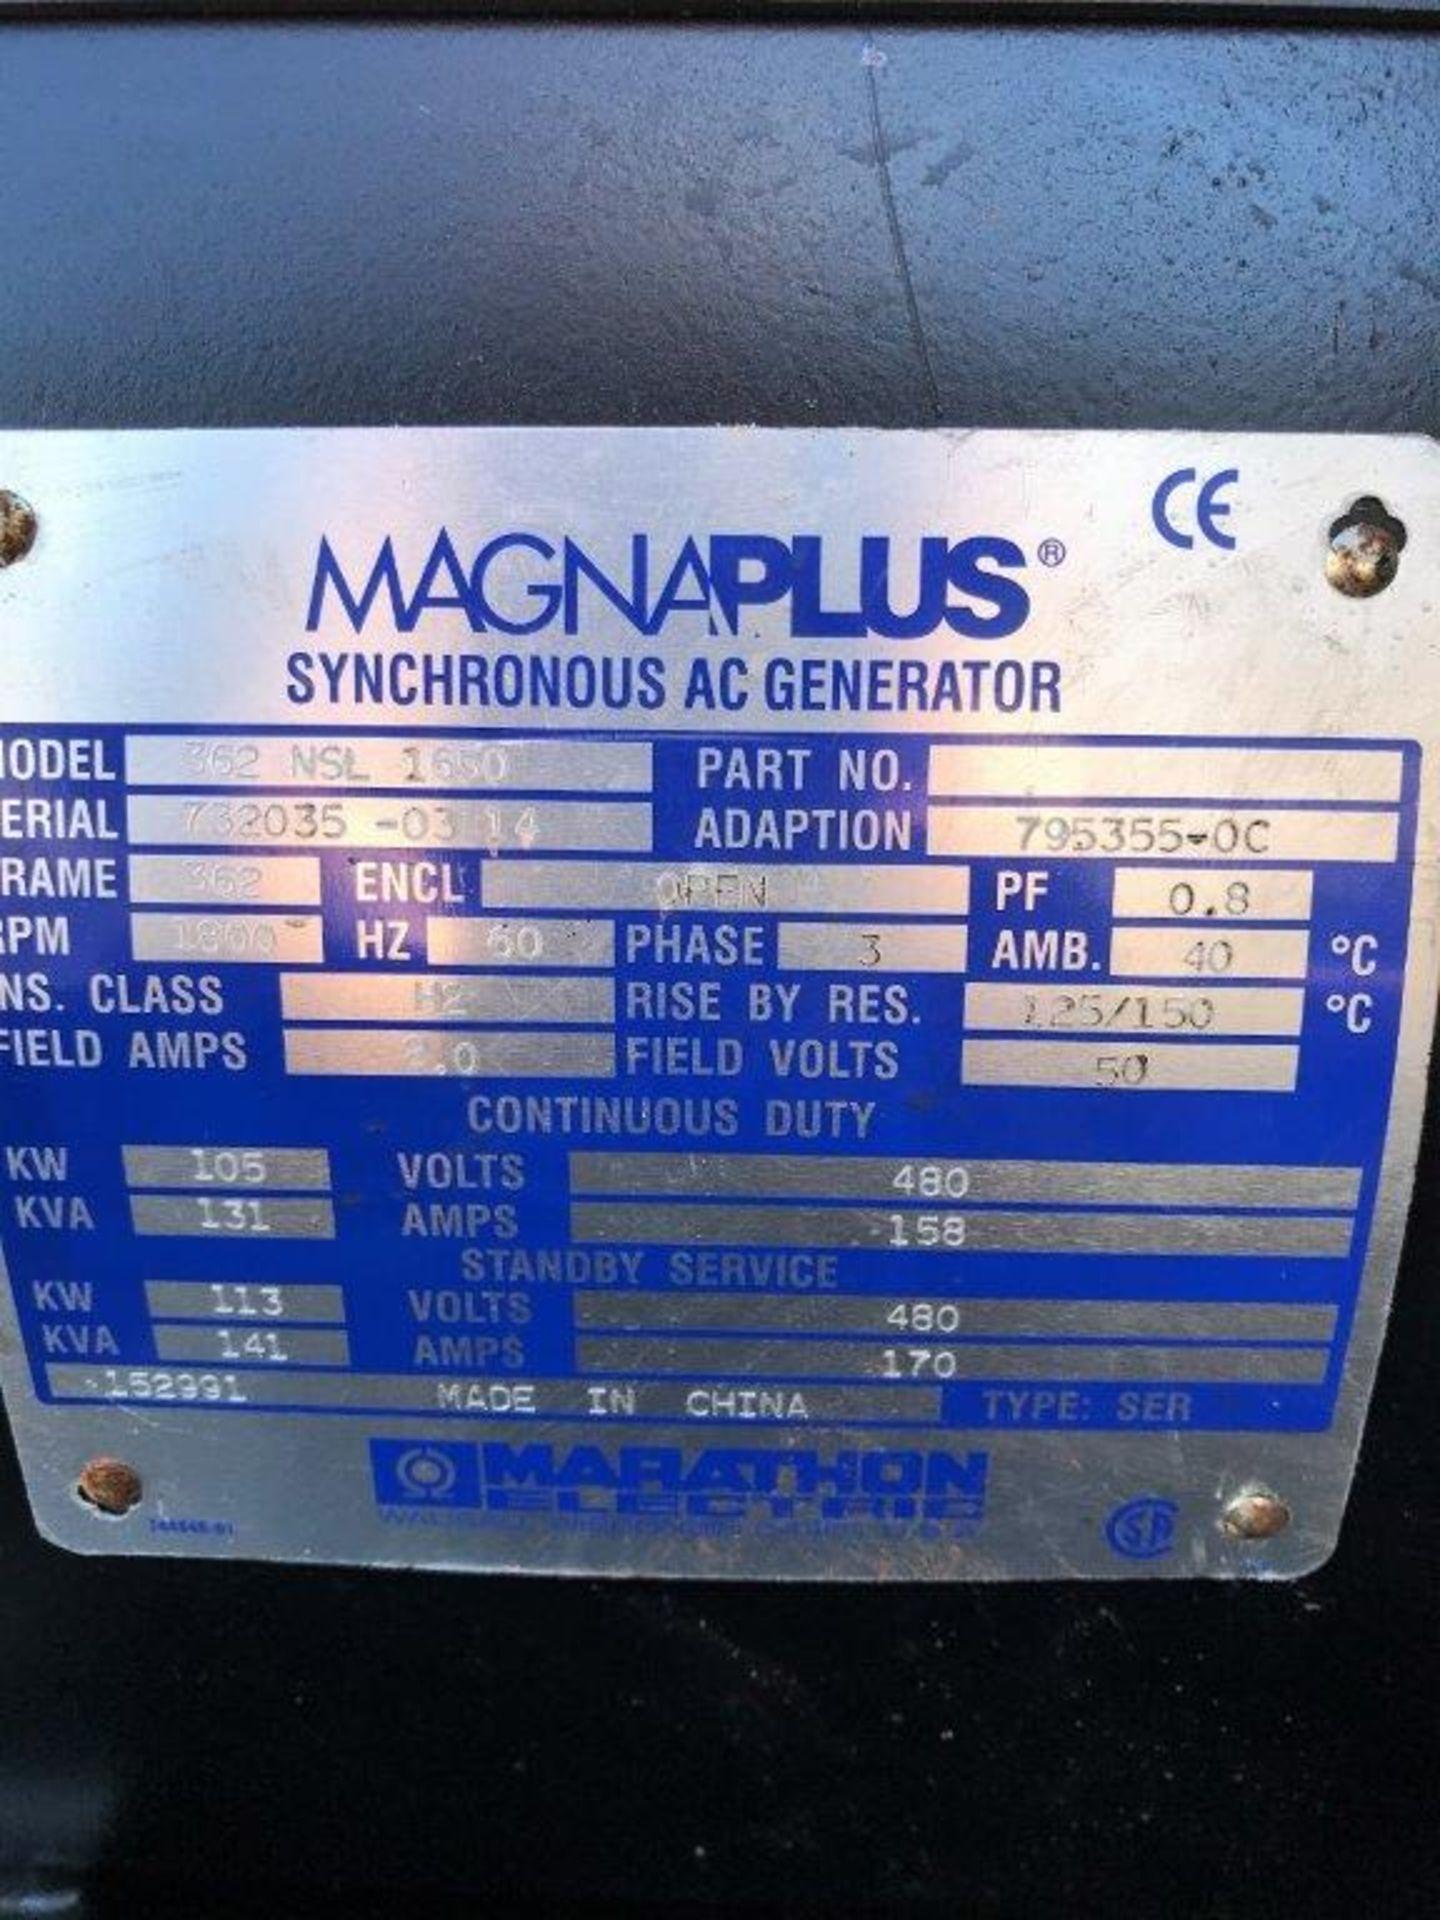 MAGNUM 100 GENERATOR, 107 KVA, 480 VAC, 3 PHASE, JOHN DEERE 4045HF ENGINE, S/N 732035-03 14, UNDER - Image 7 of 10